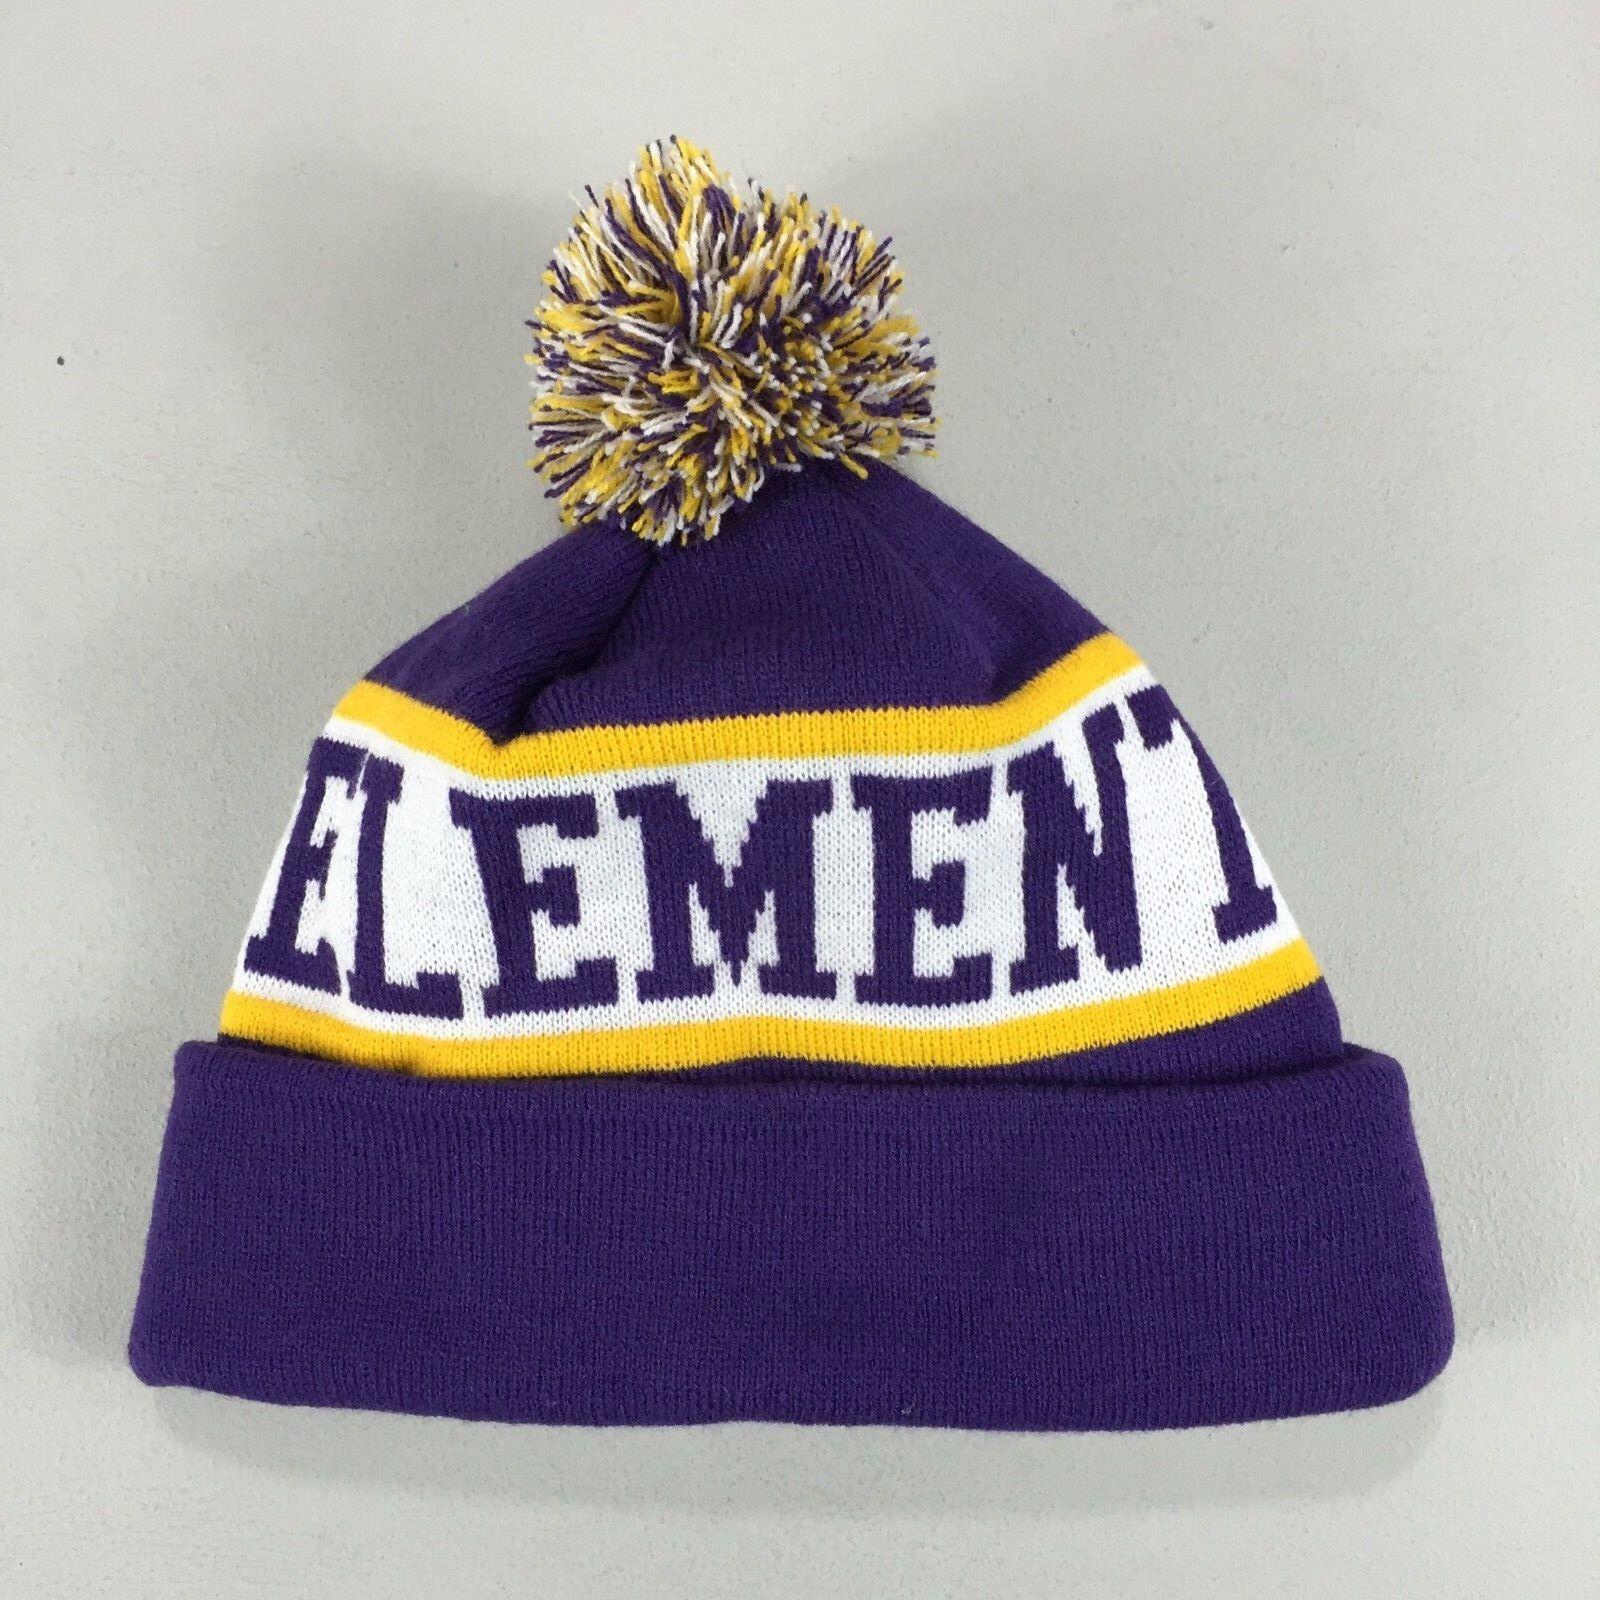 Details about Element Fairfax Pom Pom Beanie Hat Purple Brand New. 43d2c98f8d5e